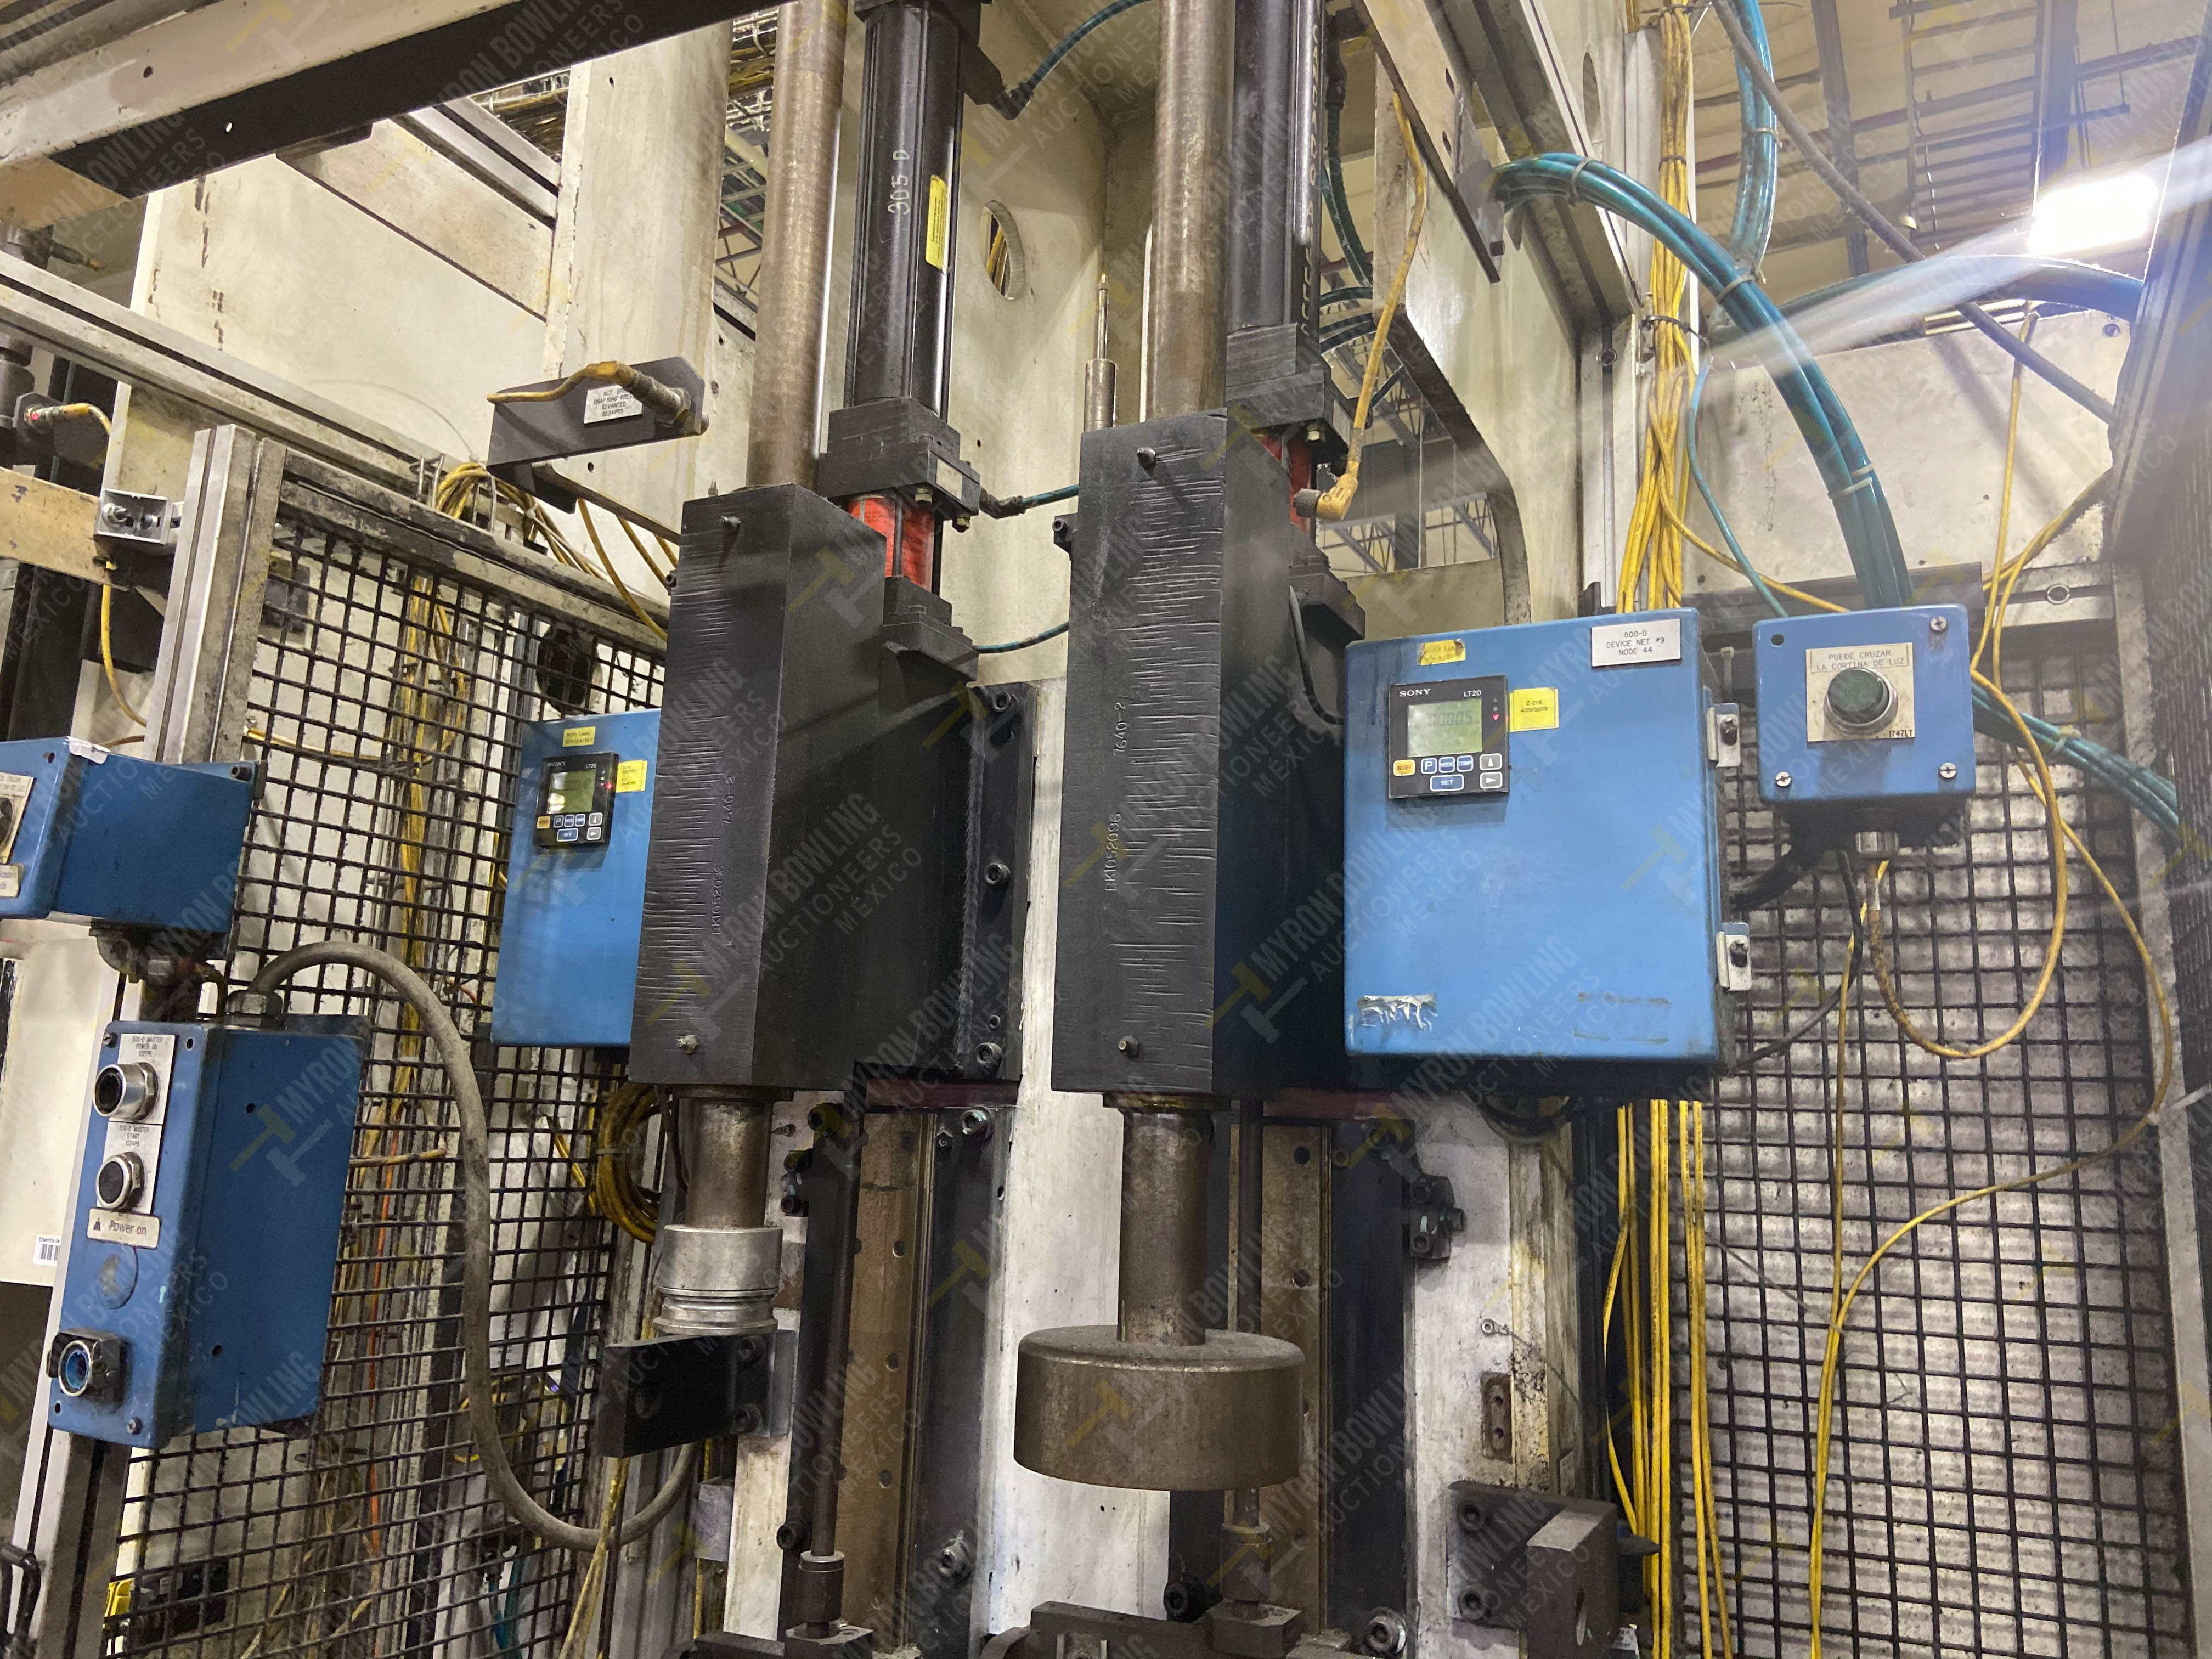 Estación semiautomática para operación 305D, contiene: Prensa tipo cuello de ganso con dos cilindros - Image 4 of 20